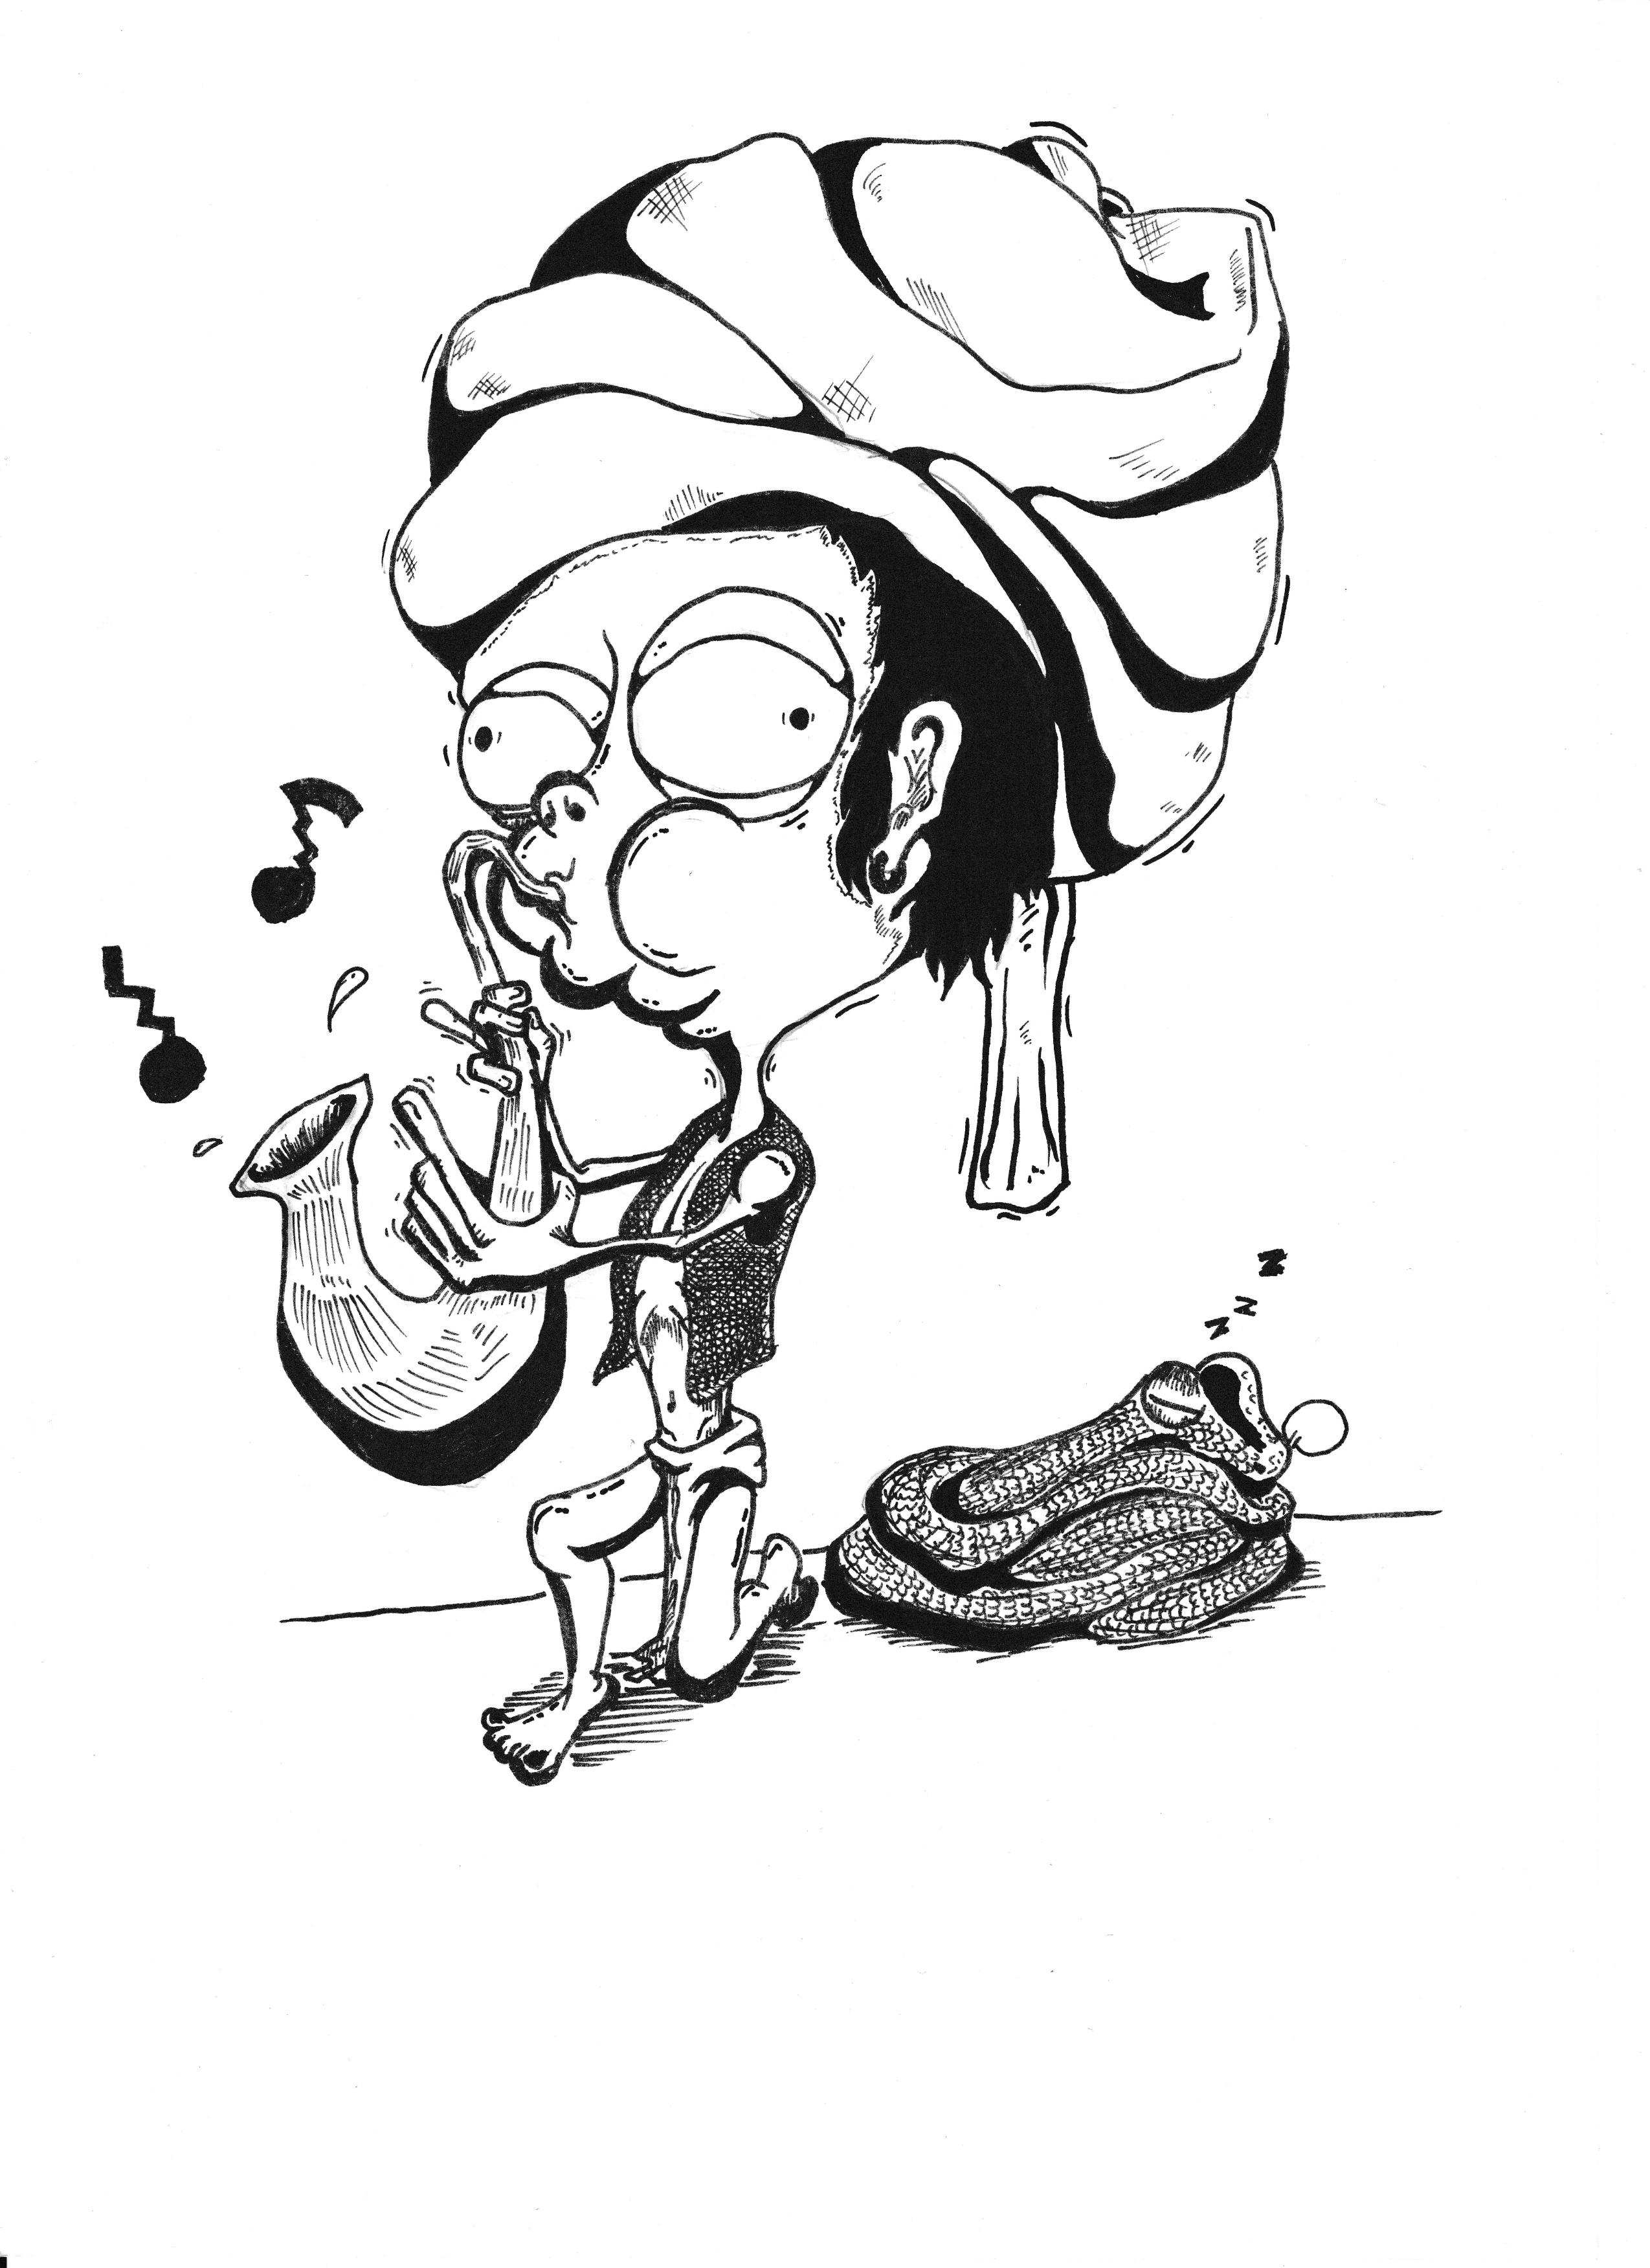 A Doodle A Day - Week 1 - Doodle #2